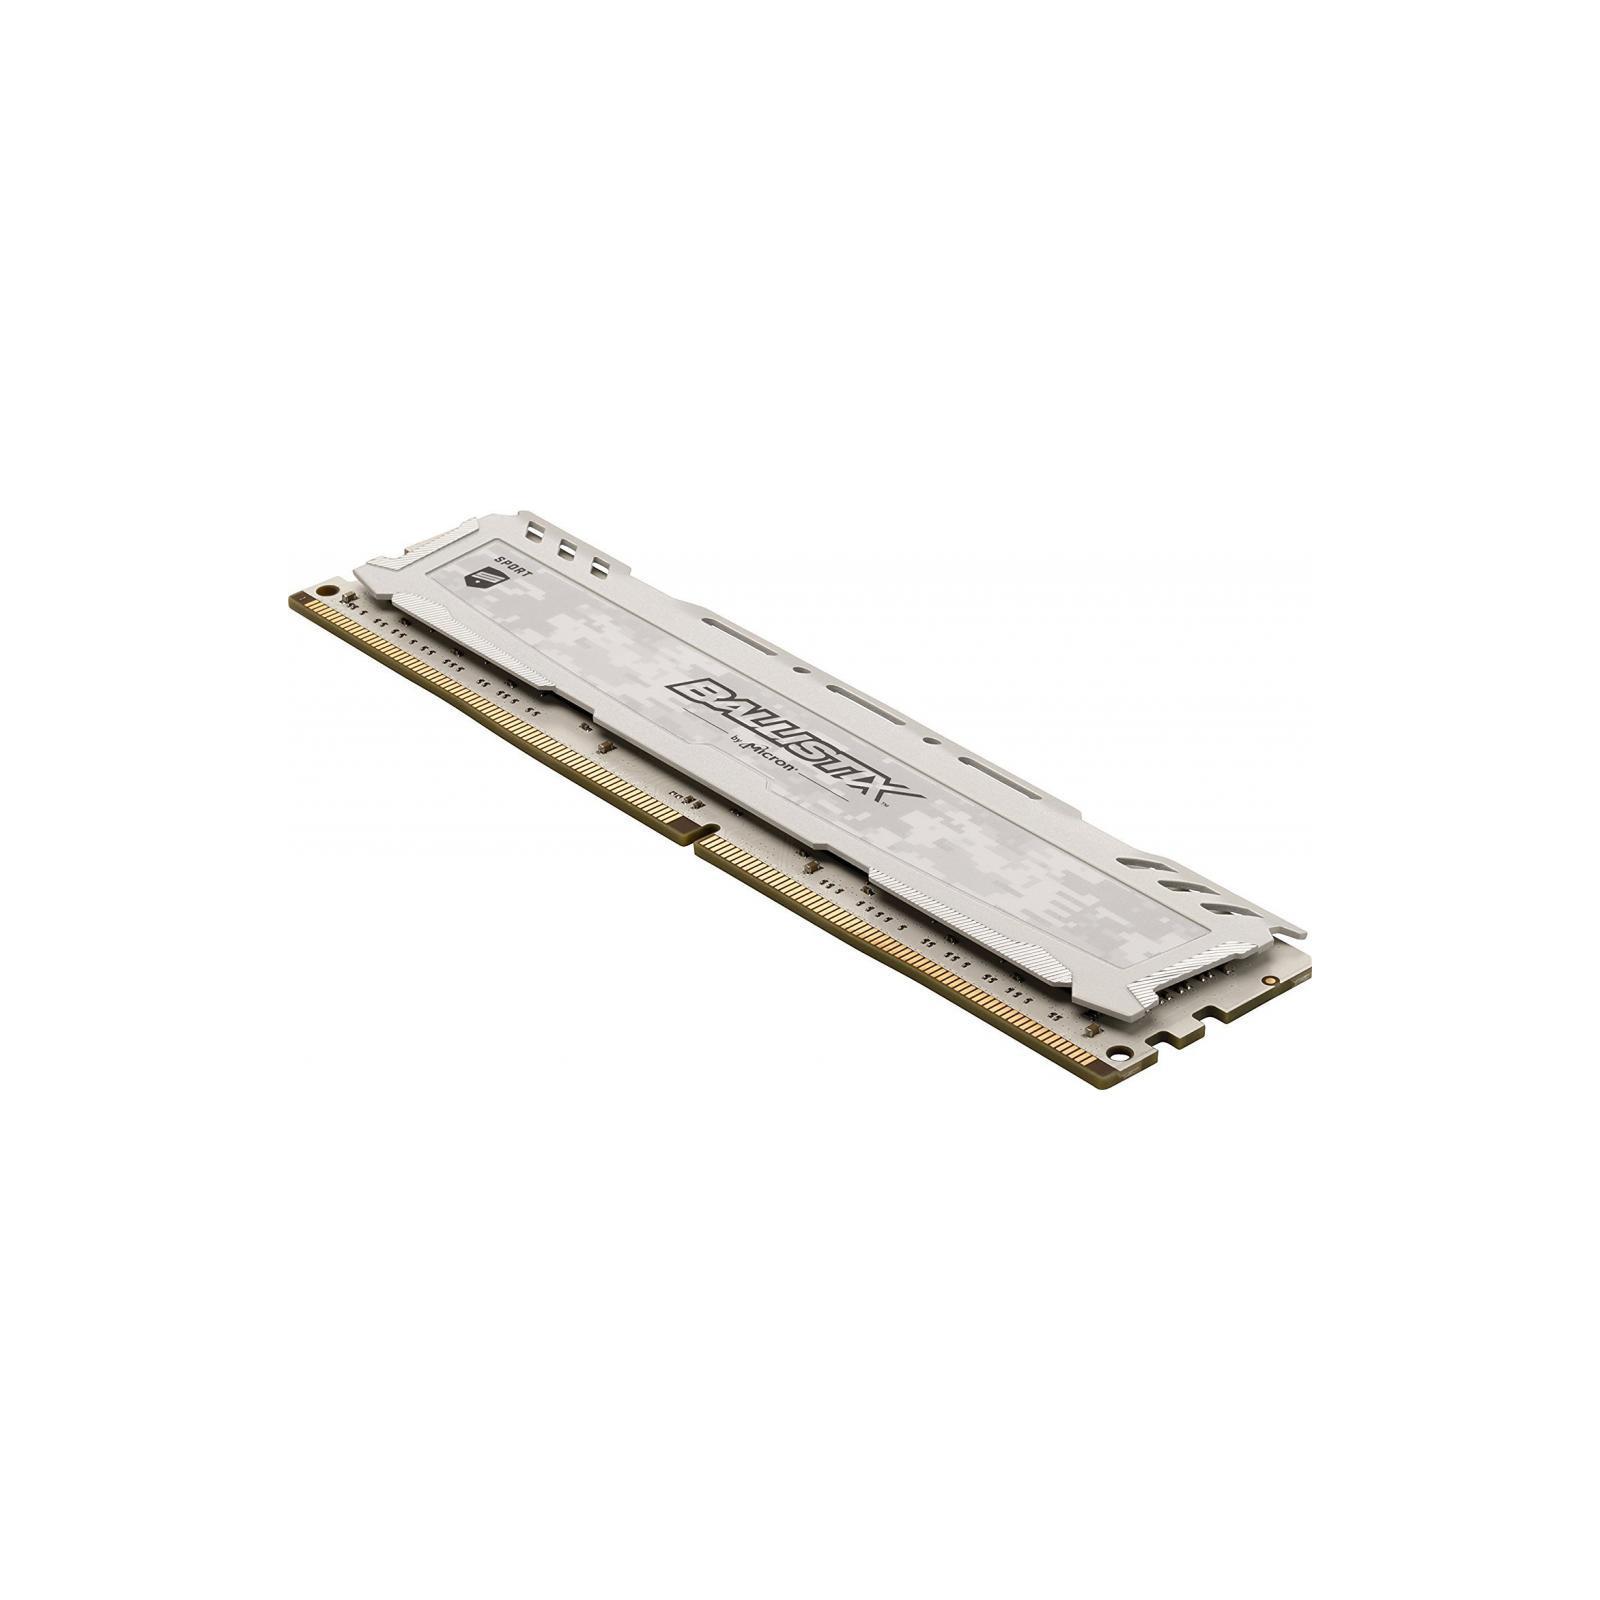 Модуль памяти для компьютера DDR4 4GB 2666 MHz Ballistix Sport LT White MICRON (BLS4G4D26BFSC) изображение 4